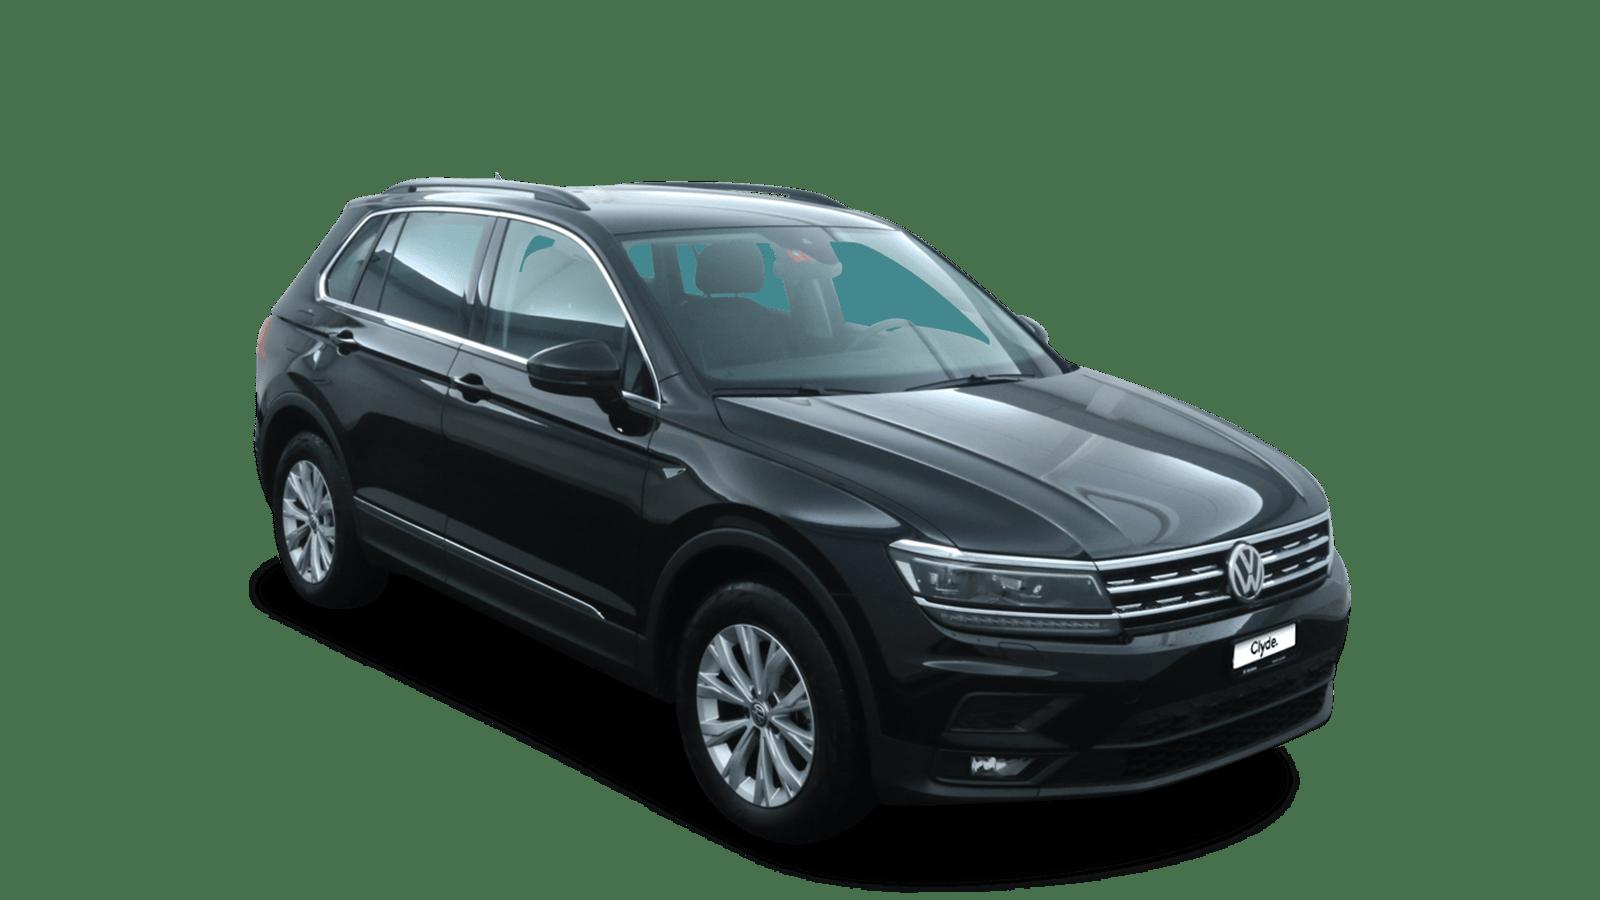 VW Tiguan Black front - Clyde car subscription